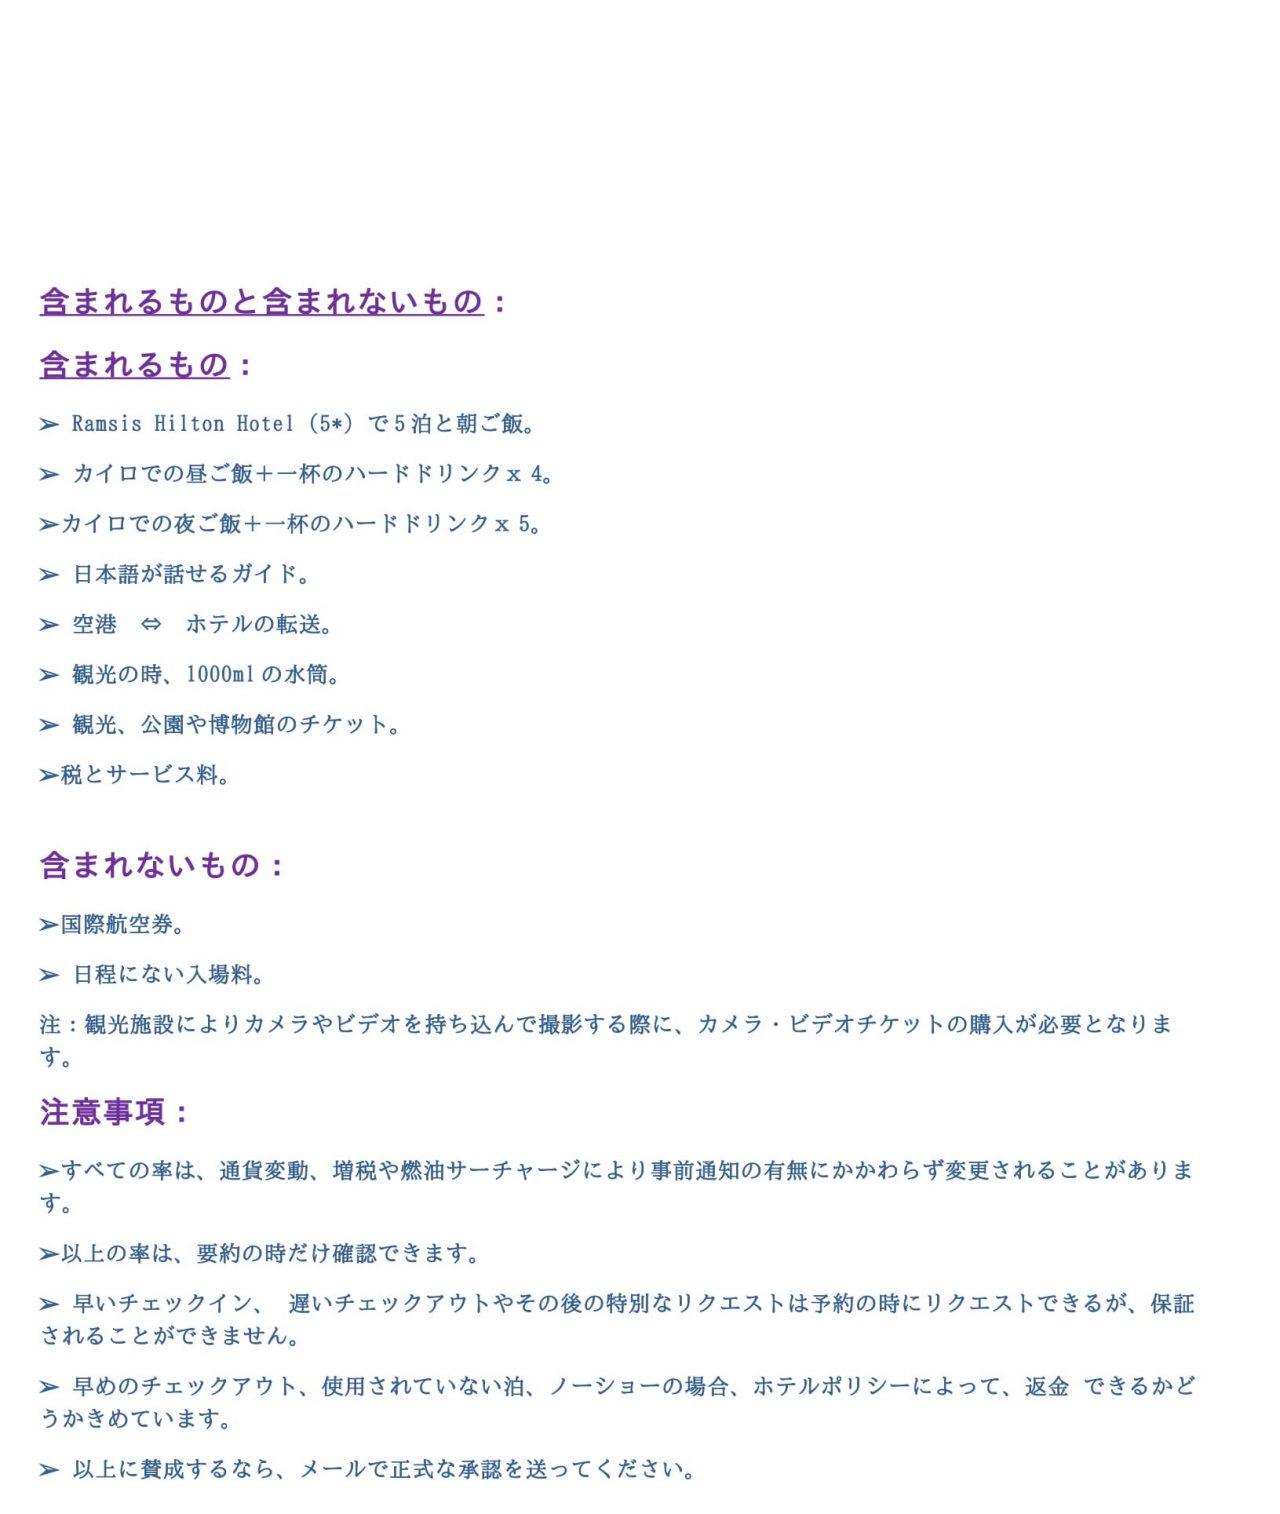 https://traveda.net/wp-content/uploads/2019/03/CAIRODAY-USE@-ALEXANDRIA-06DAYS-05NIGHTS-Japanese-2-1280x1514.jpg